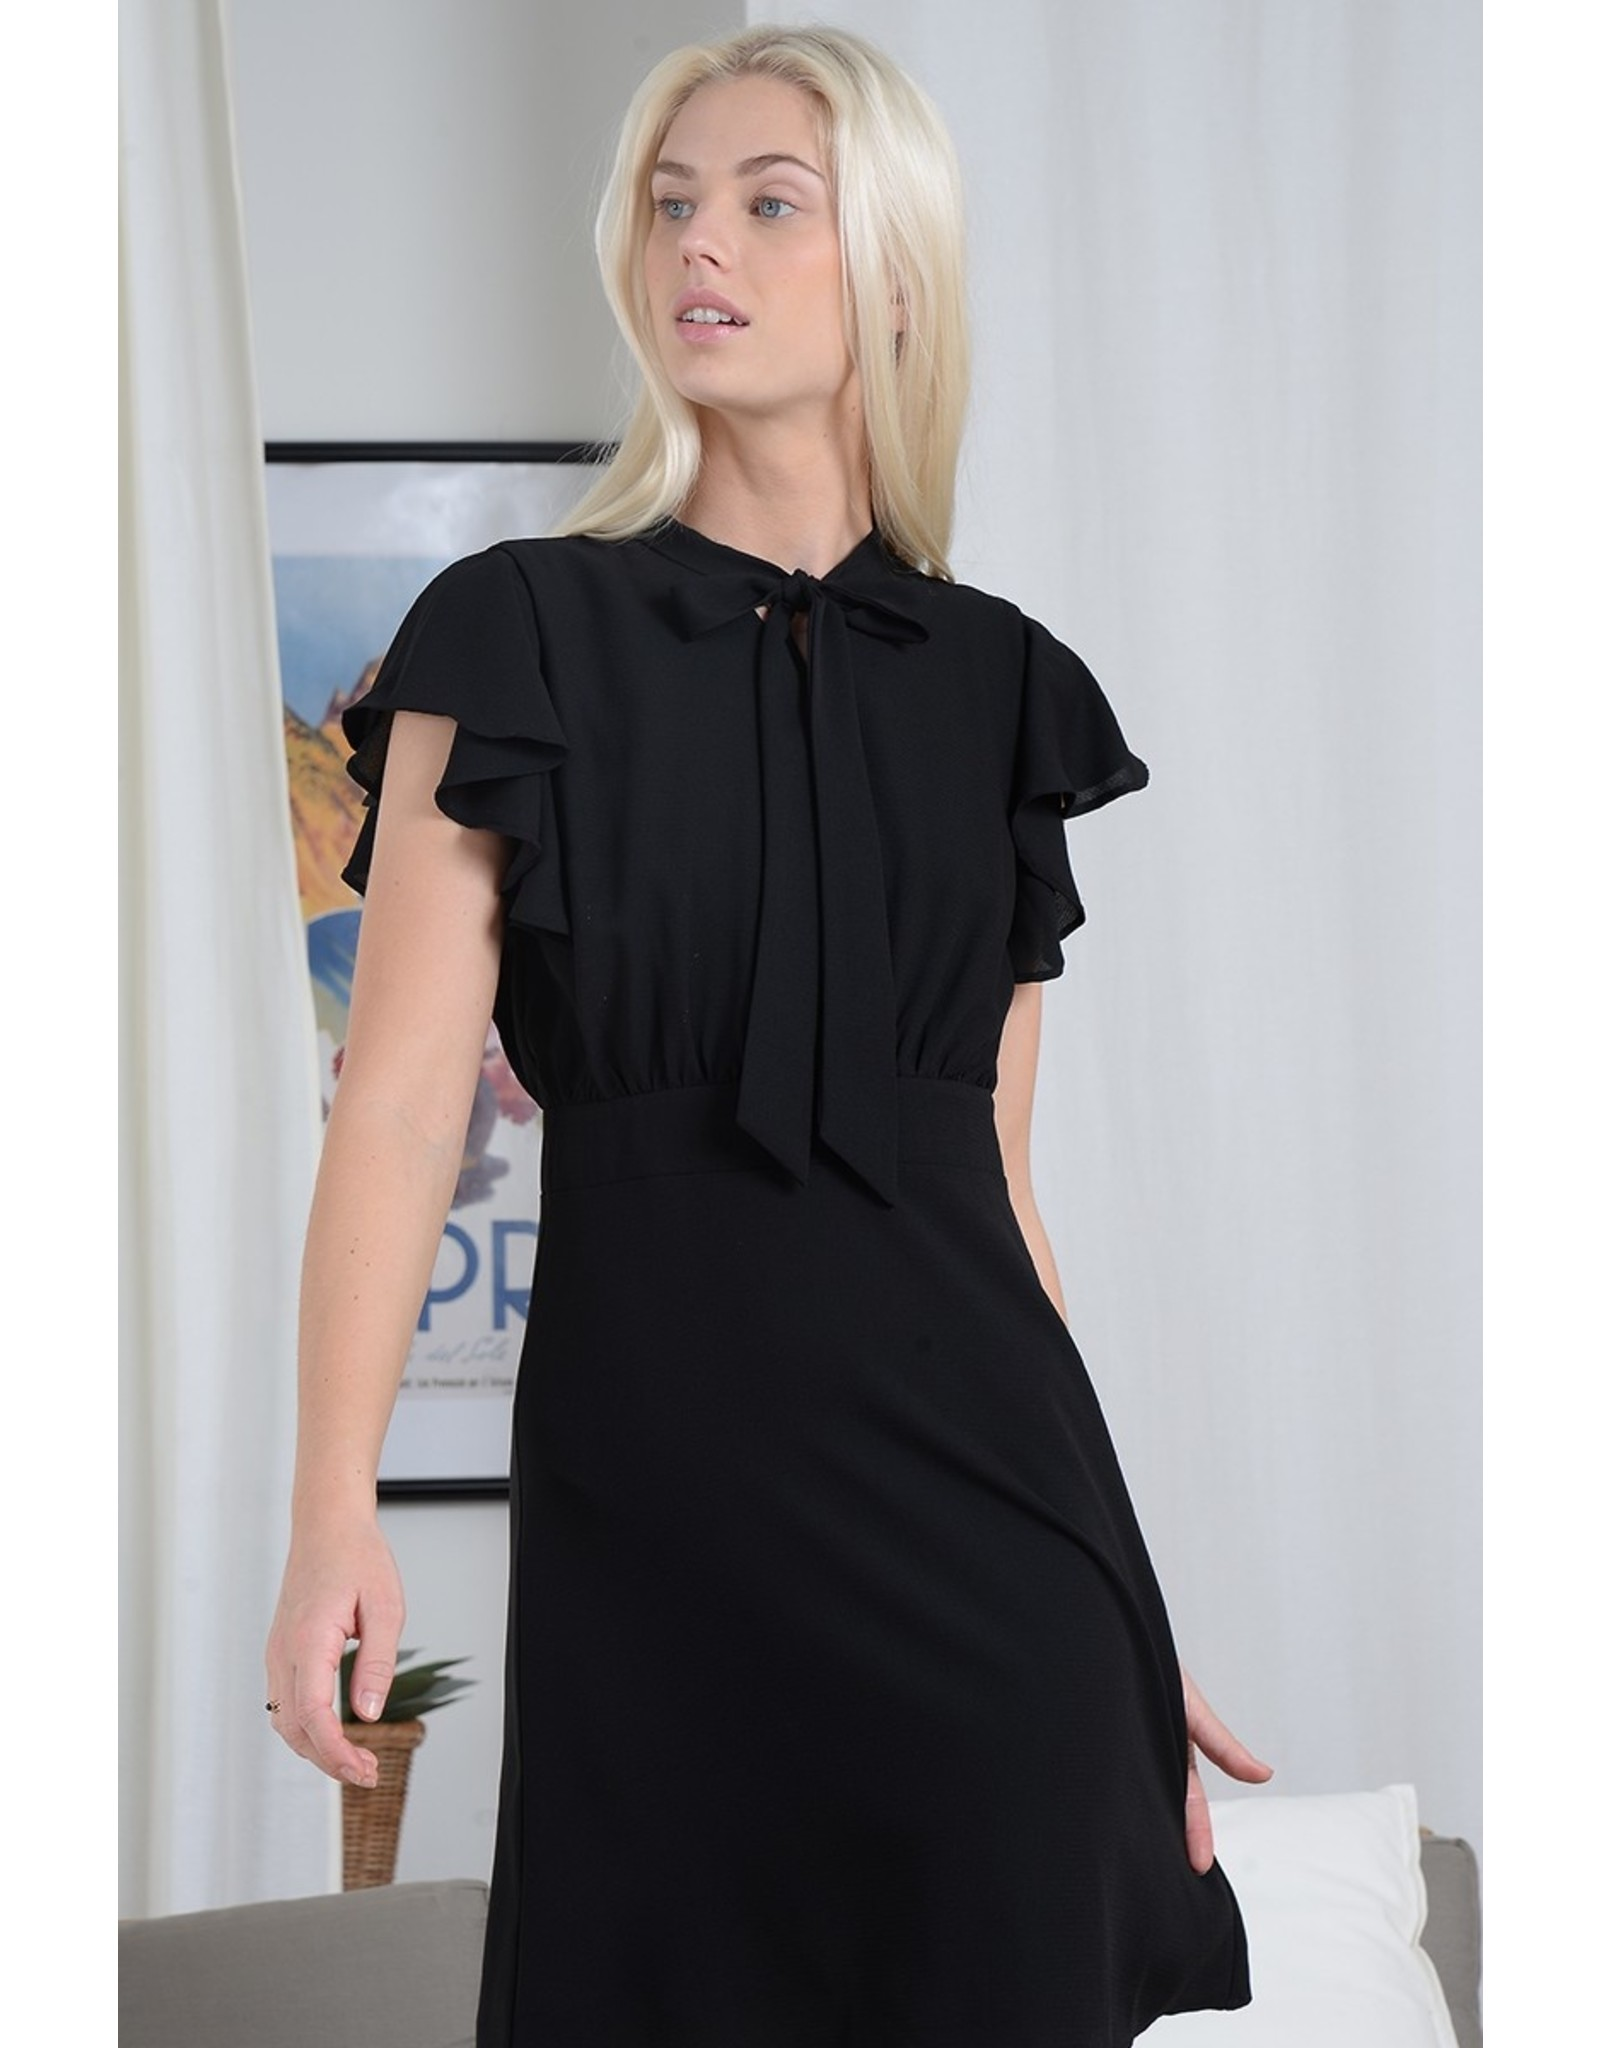 MOLLY BRACKEN BAGHEERA DRESS